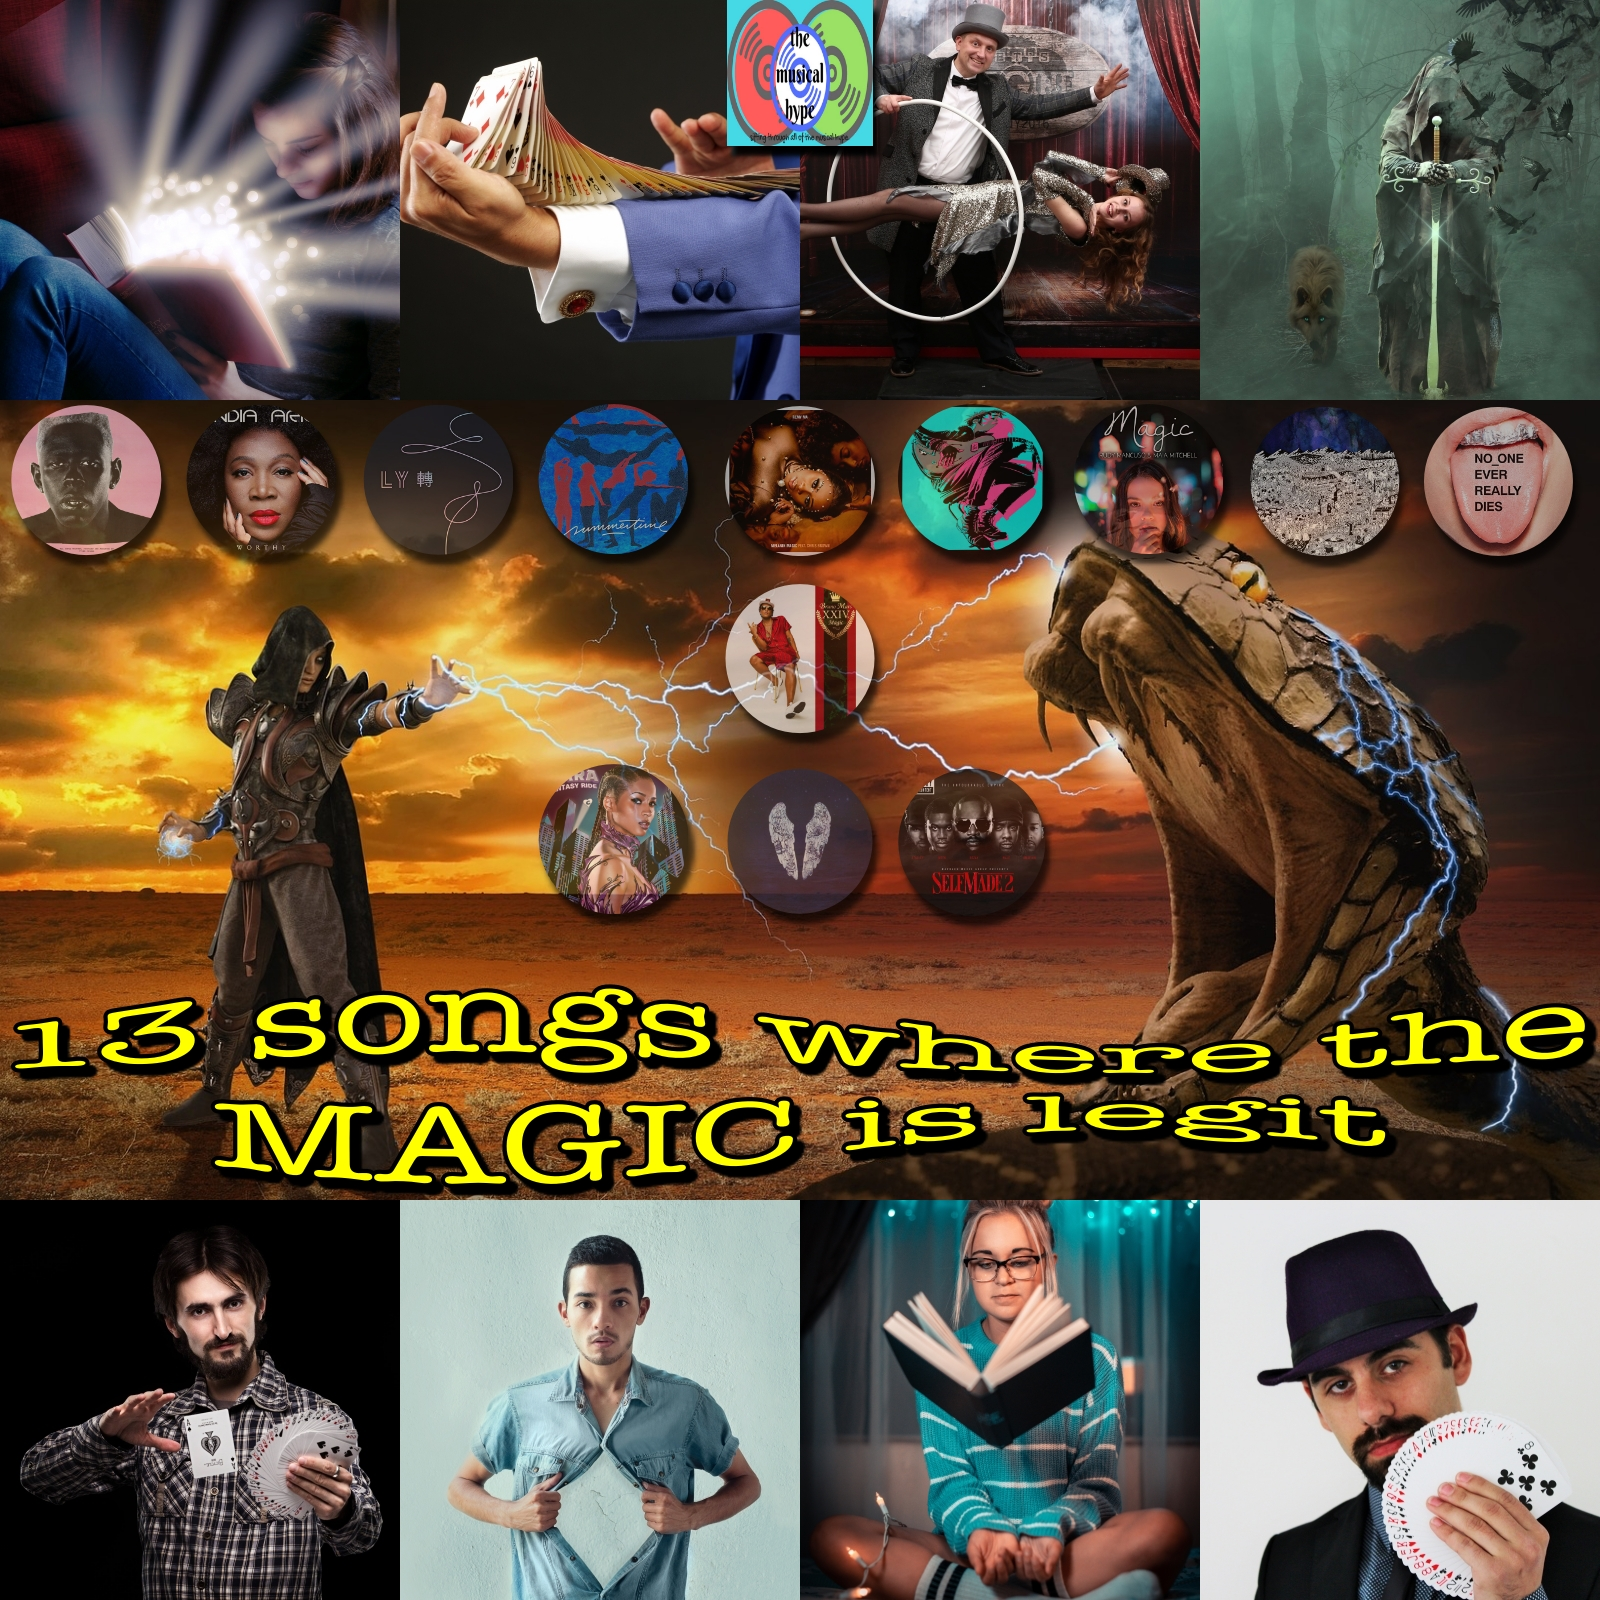 13 Songs Where the Magic is Legit | Playlist